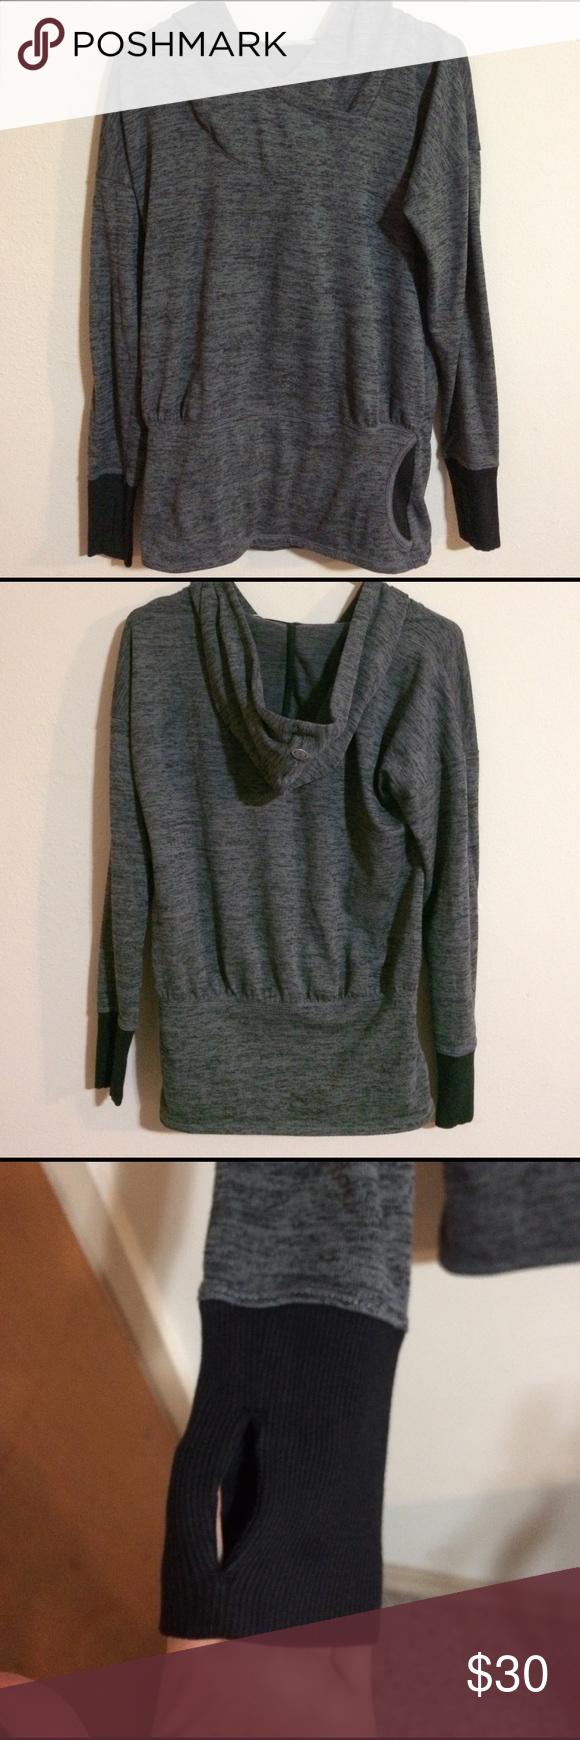 Sweatshirt ❤ EUC! Has thumb holes. Not lululemon lululemon athletica Tops Sweatshirts & Hoodies